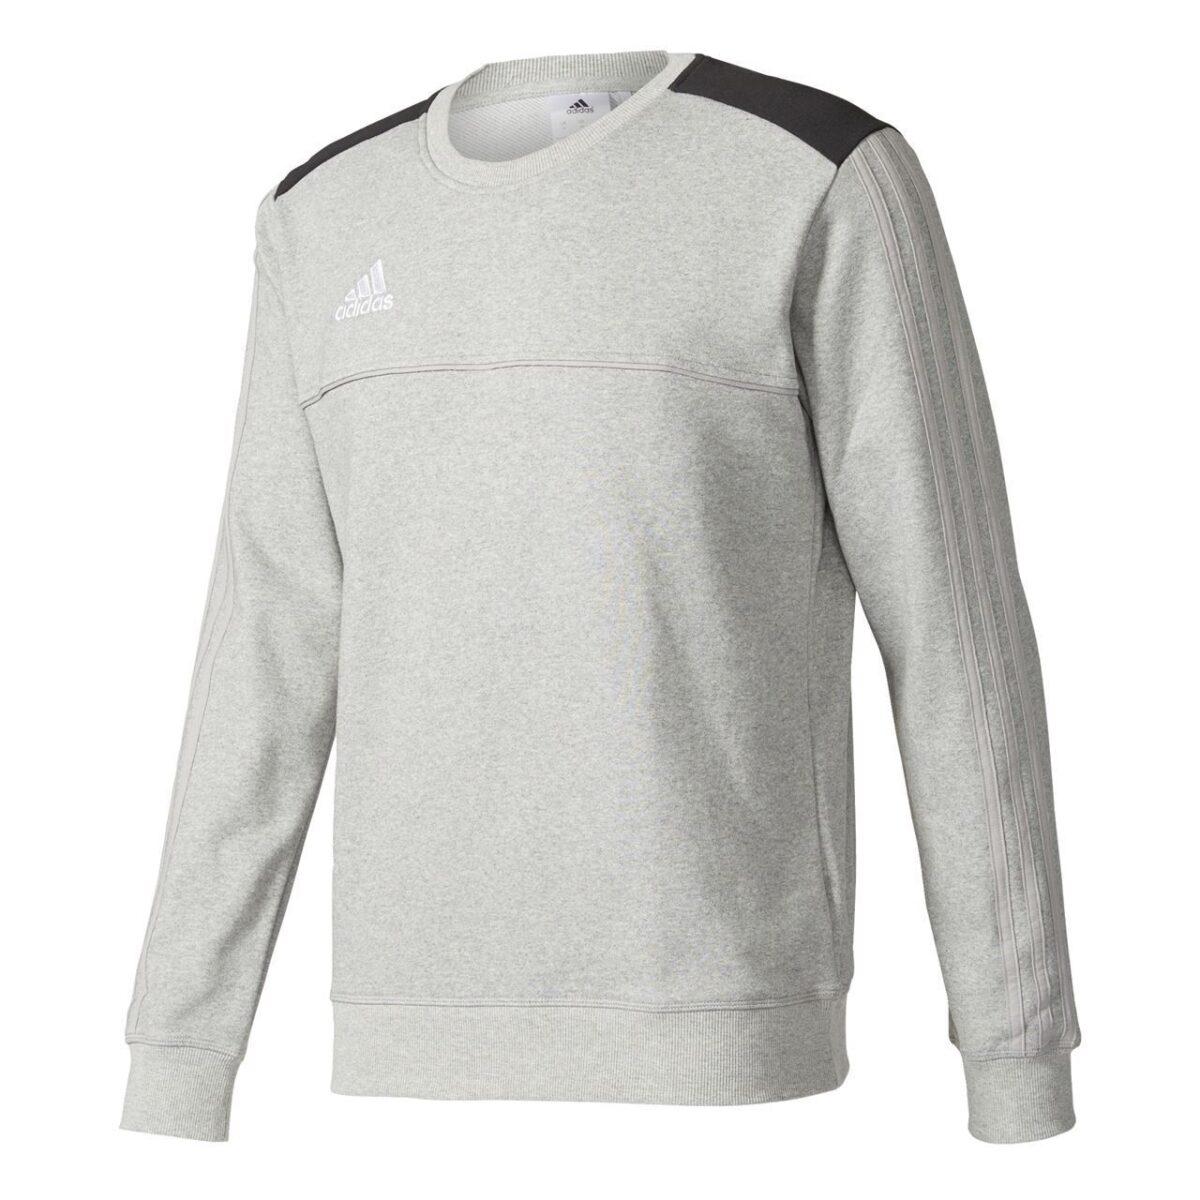 Adidas Tiro 17 Sweat Top AY2962 Grey/Black